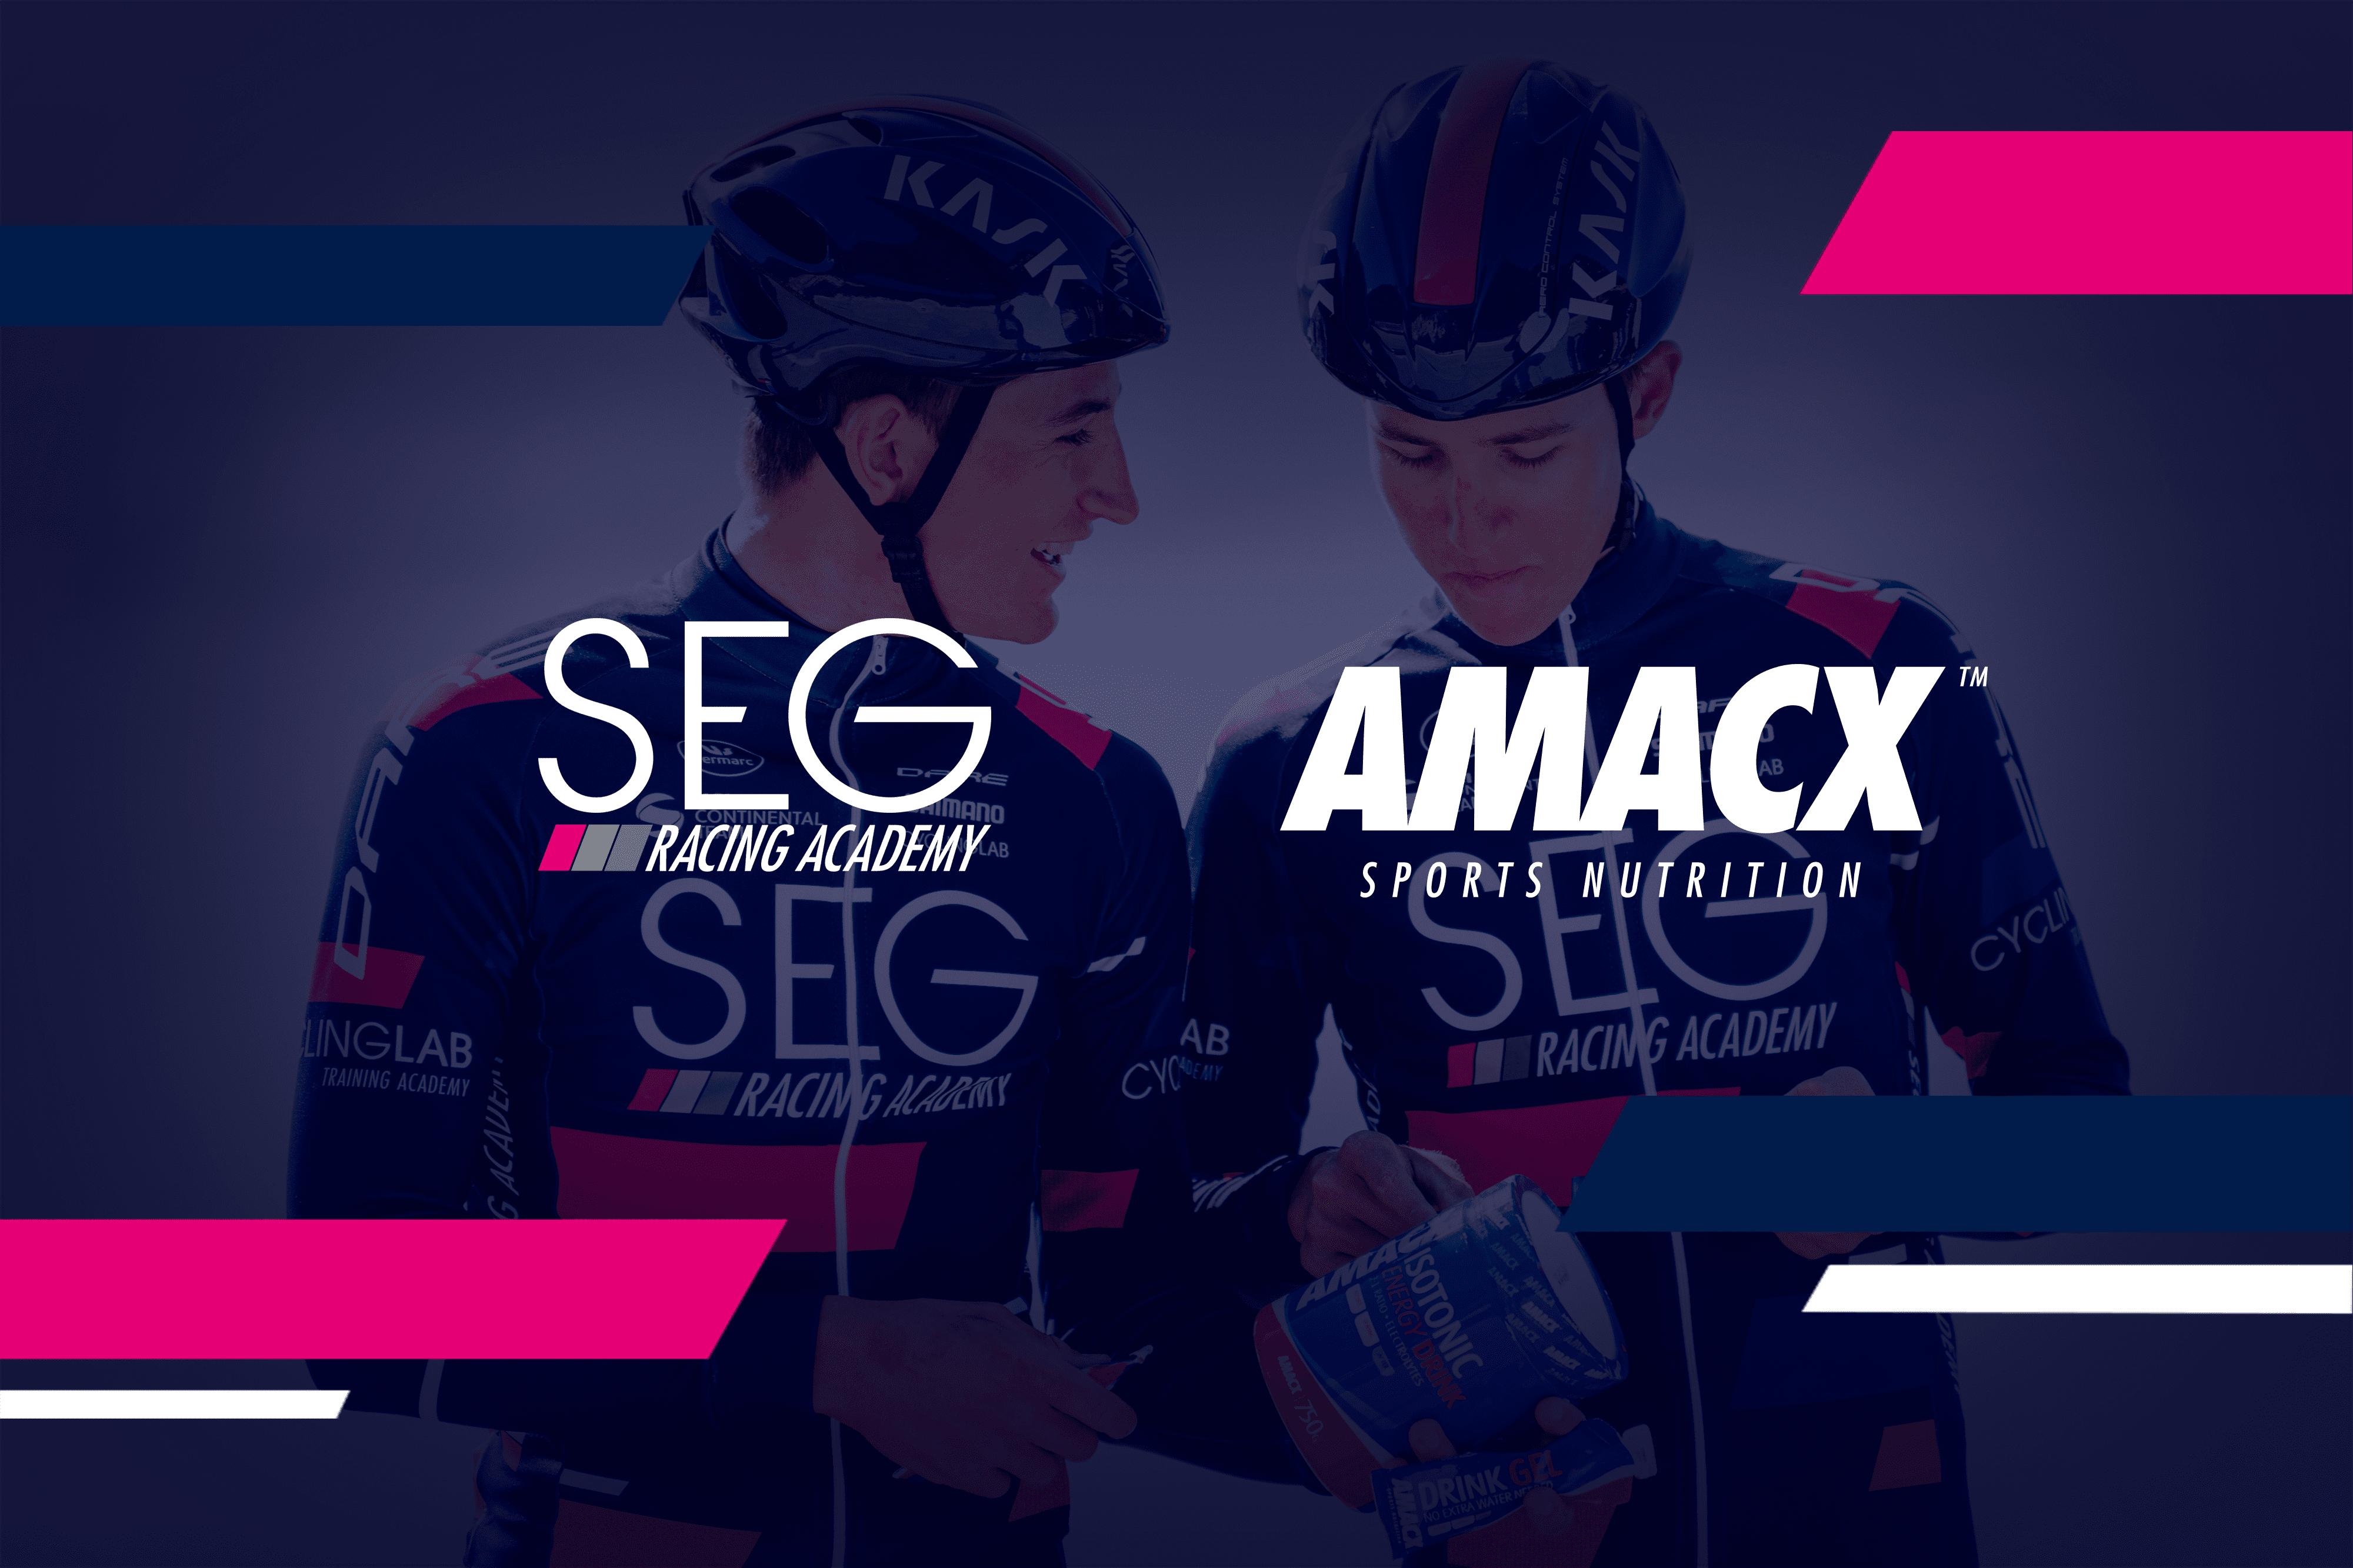 SEG Racing Academy - Amacx Sports Nutrition